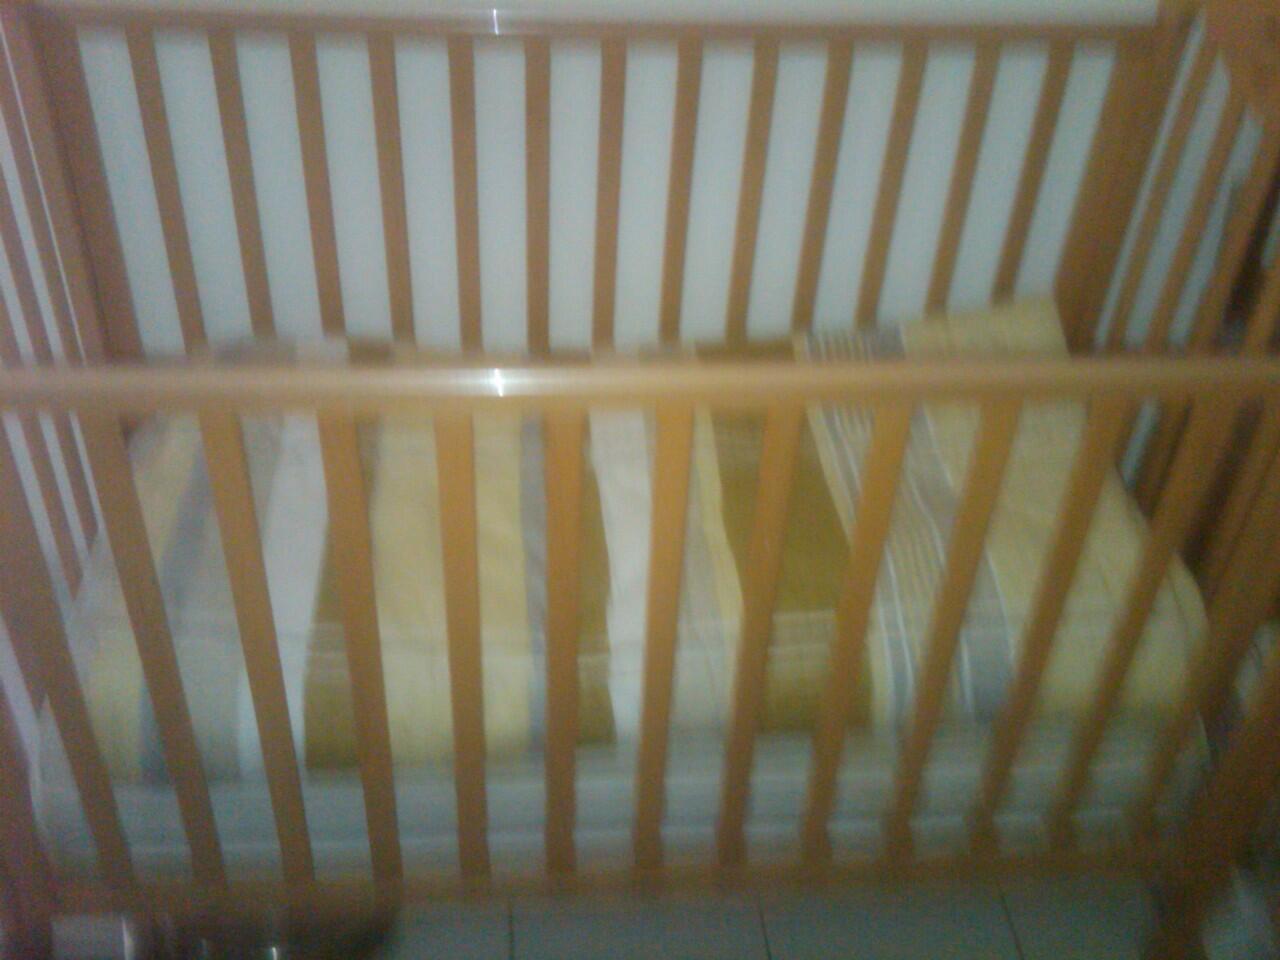 Tempat Tidur dan Dorongan Bayi